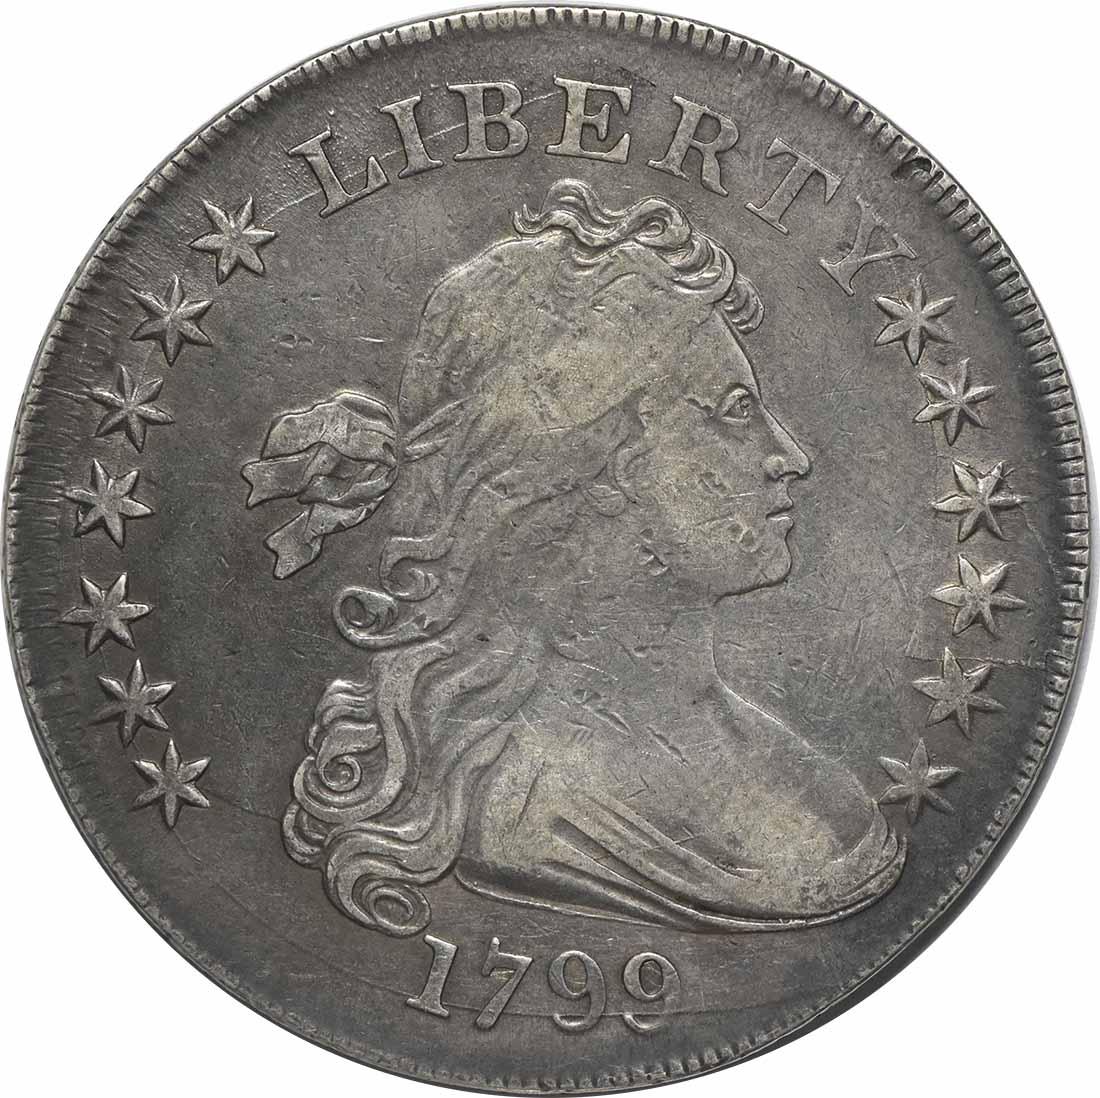 1799 Bust Silver Dollar VF Uncertified